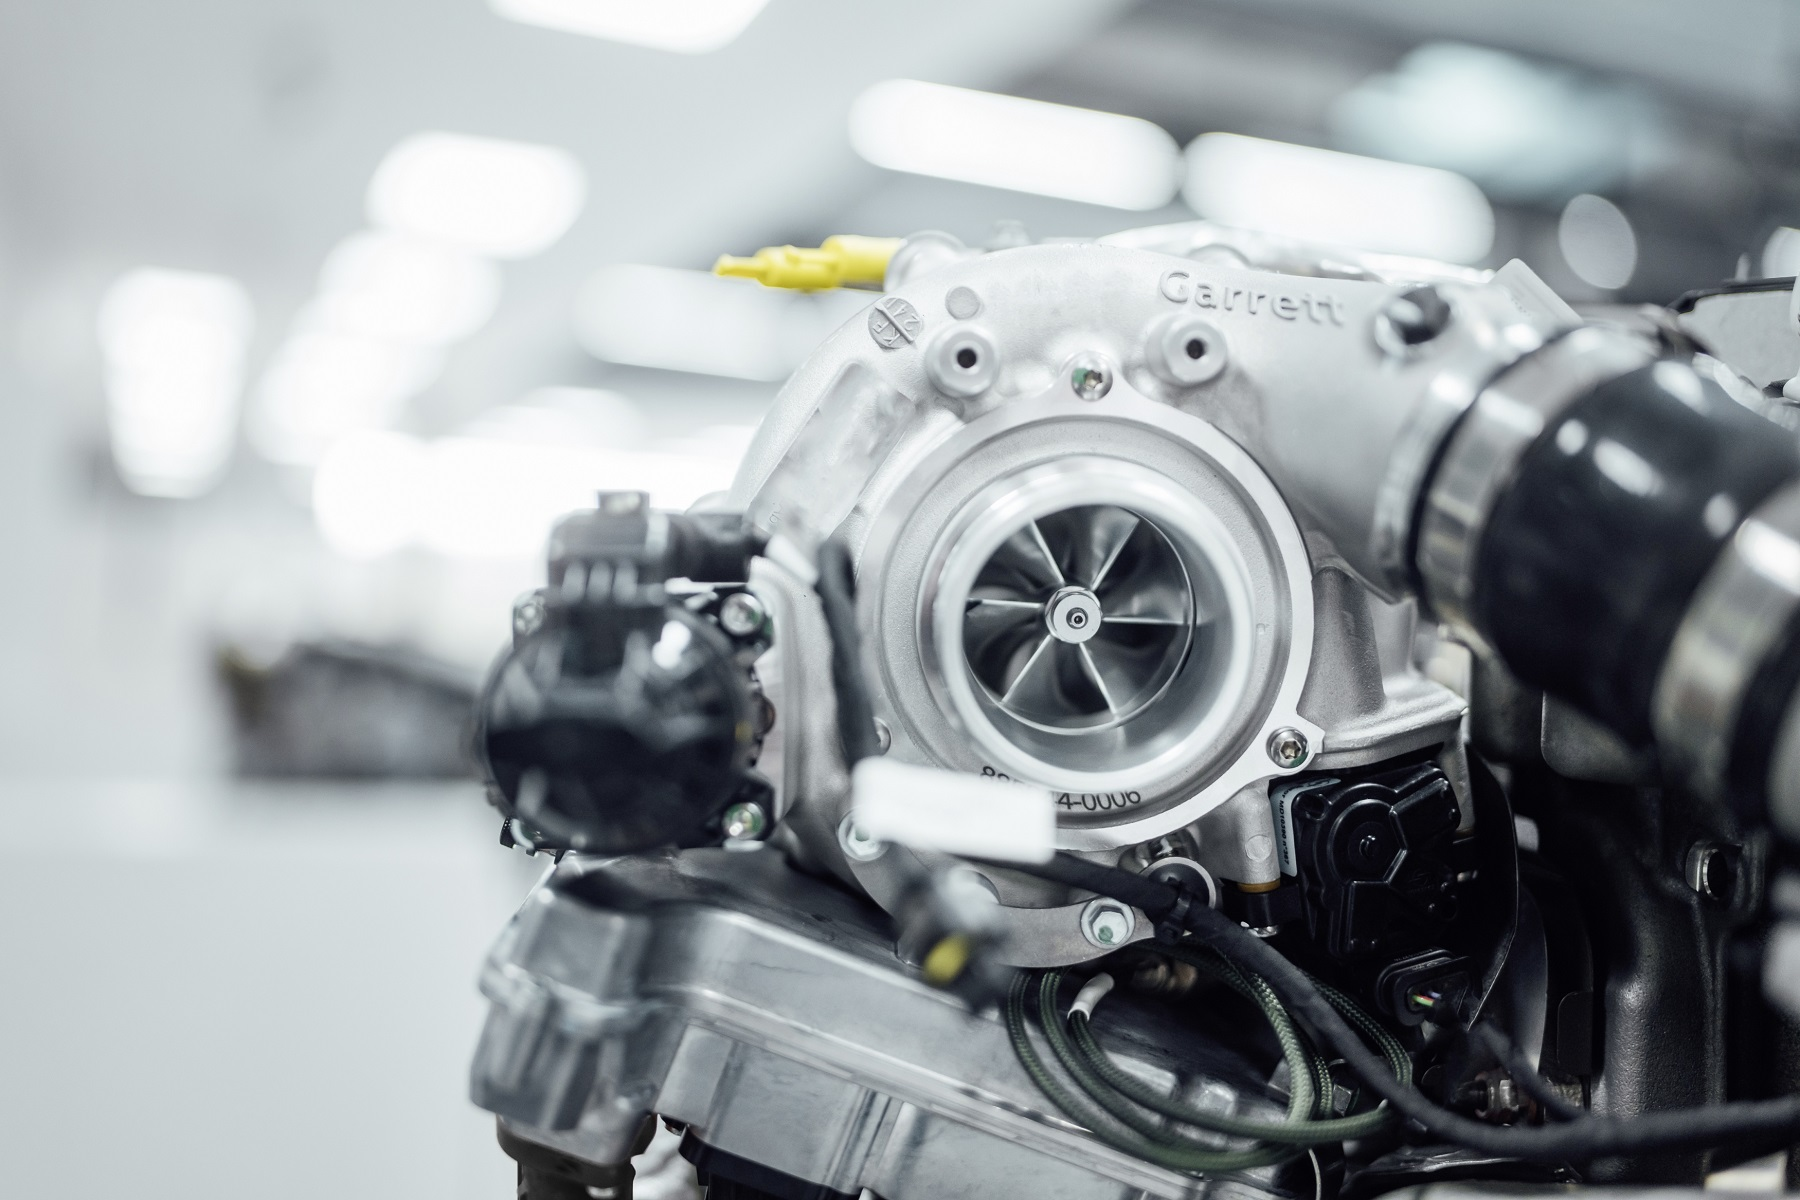 Mercedes použije elektrické turbo z Formuly 1